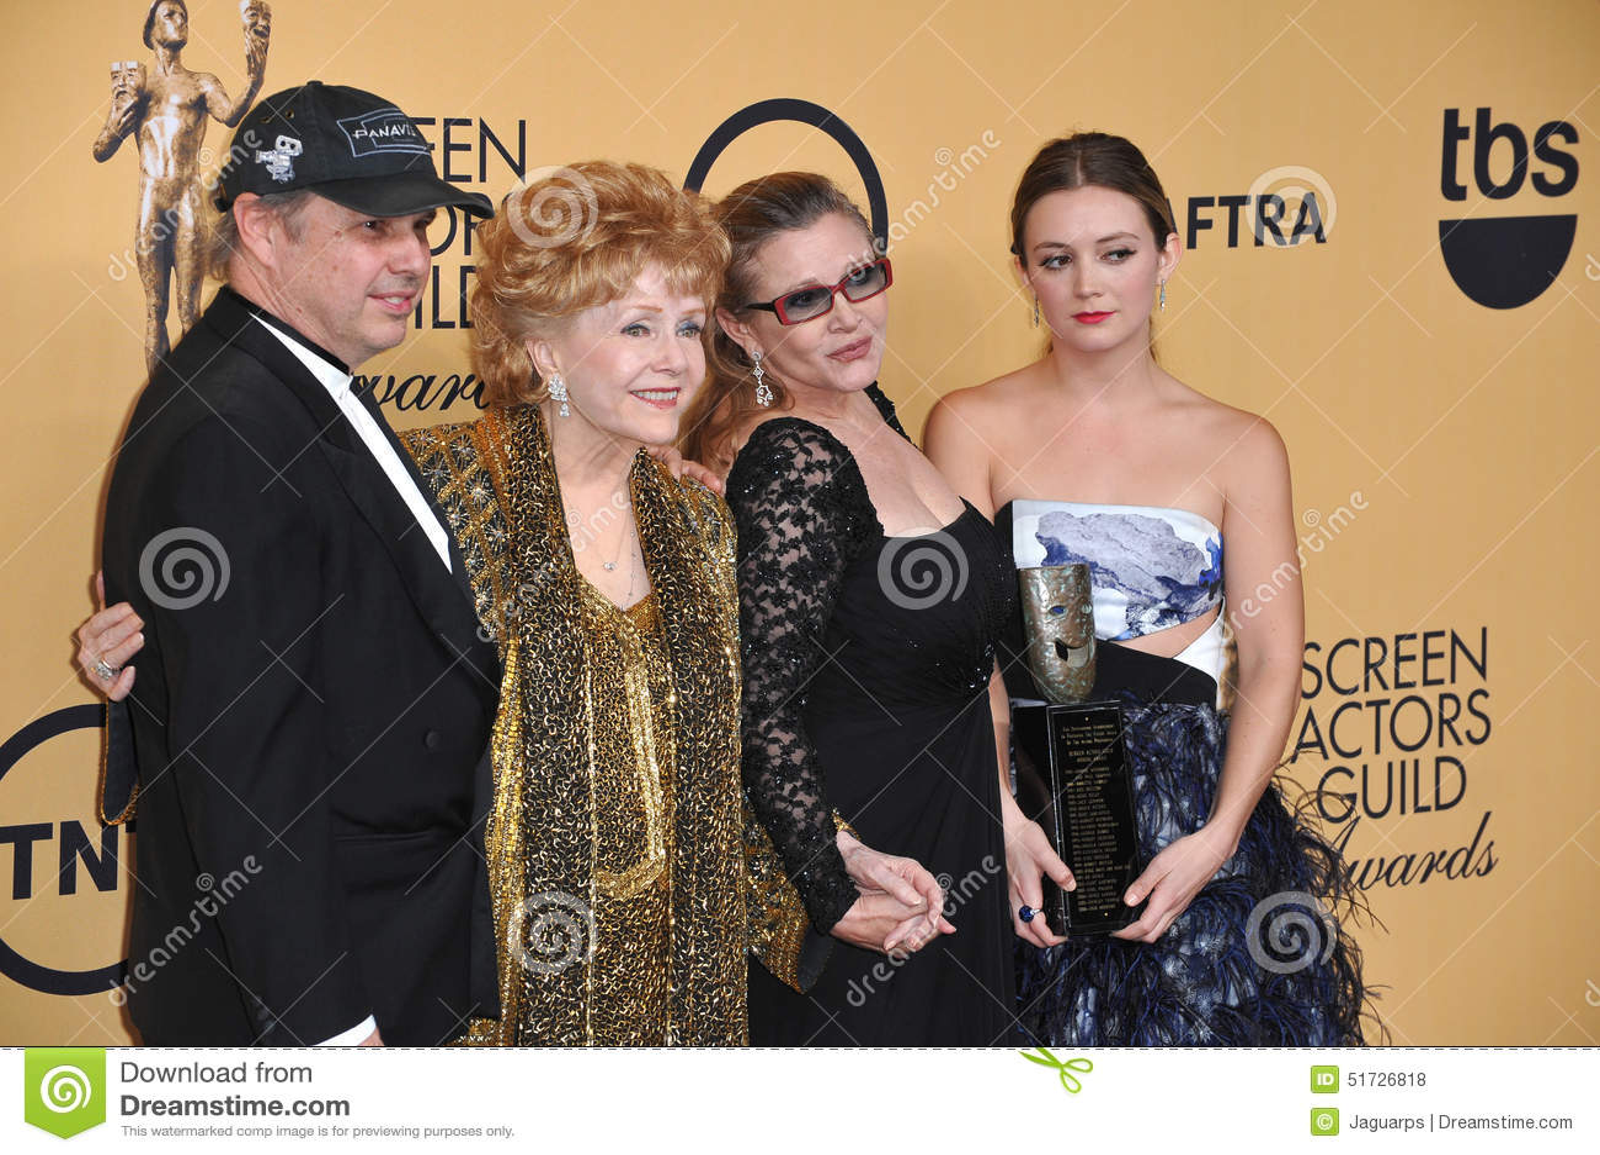 Debbie Reynolds u. Carrie Fisher u. Todd Fisher u. Billie Lourd